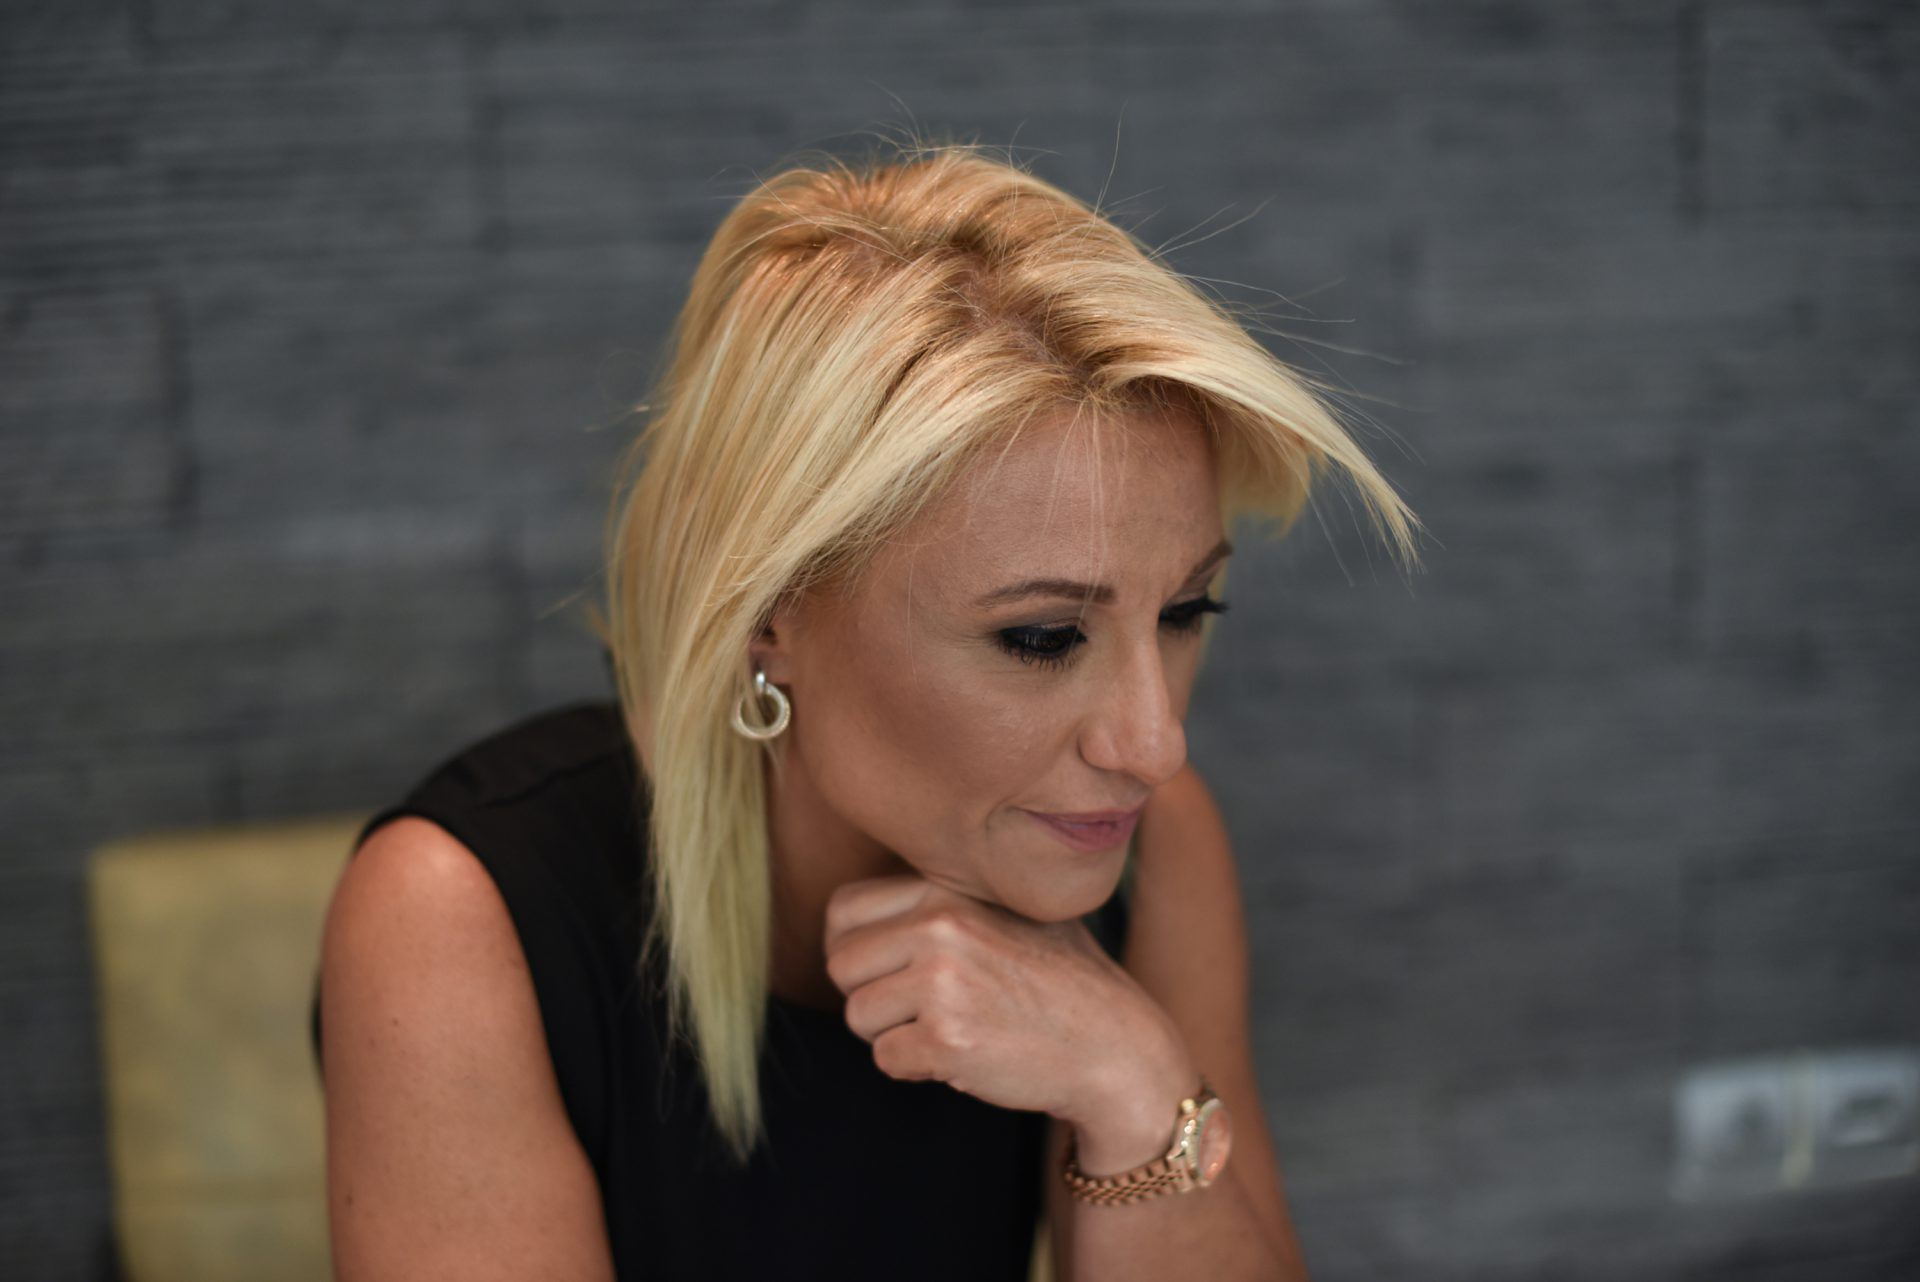 Cristina Morfiri Cosmetic Dentist in Glyfada